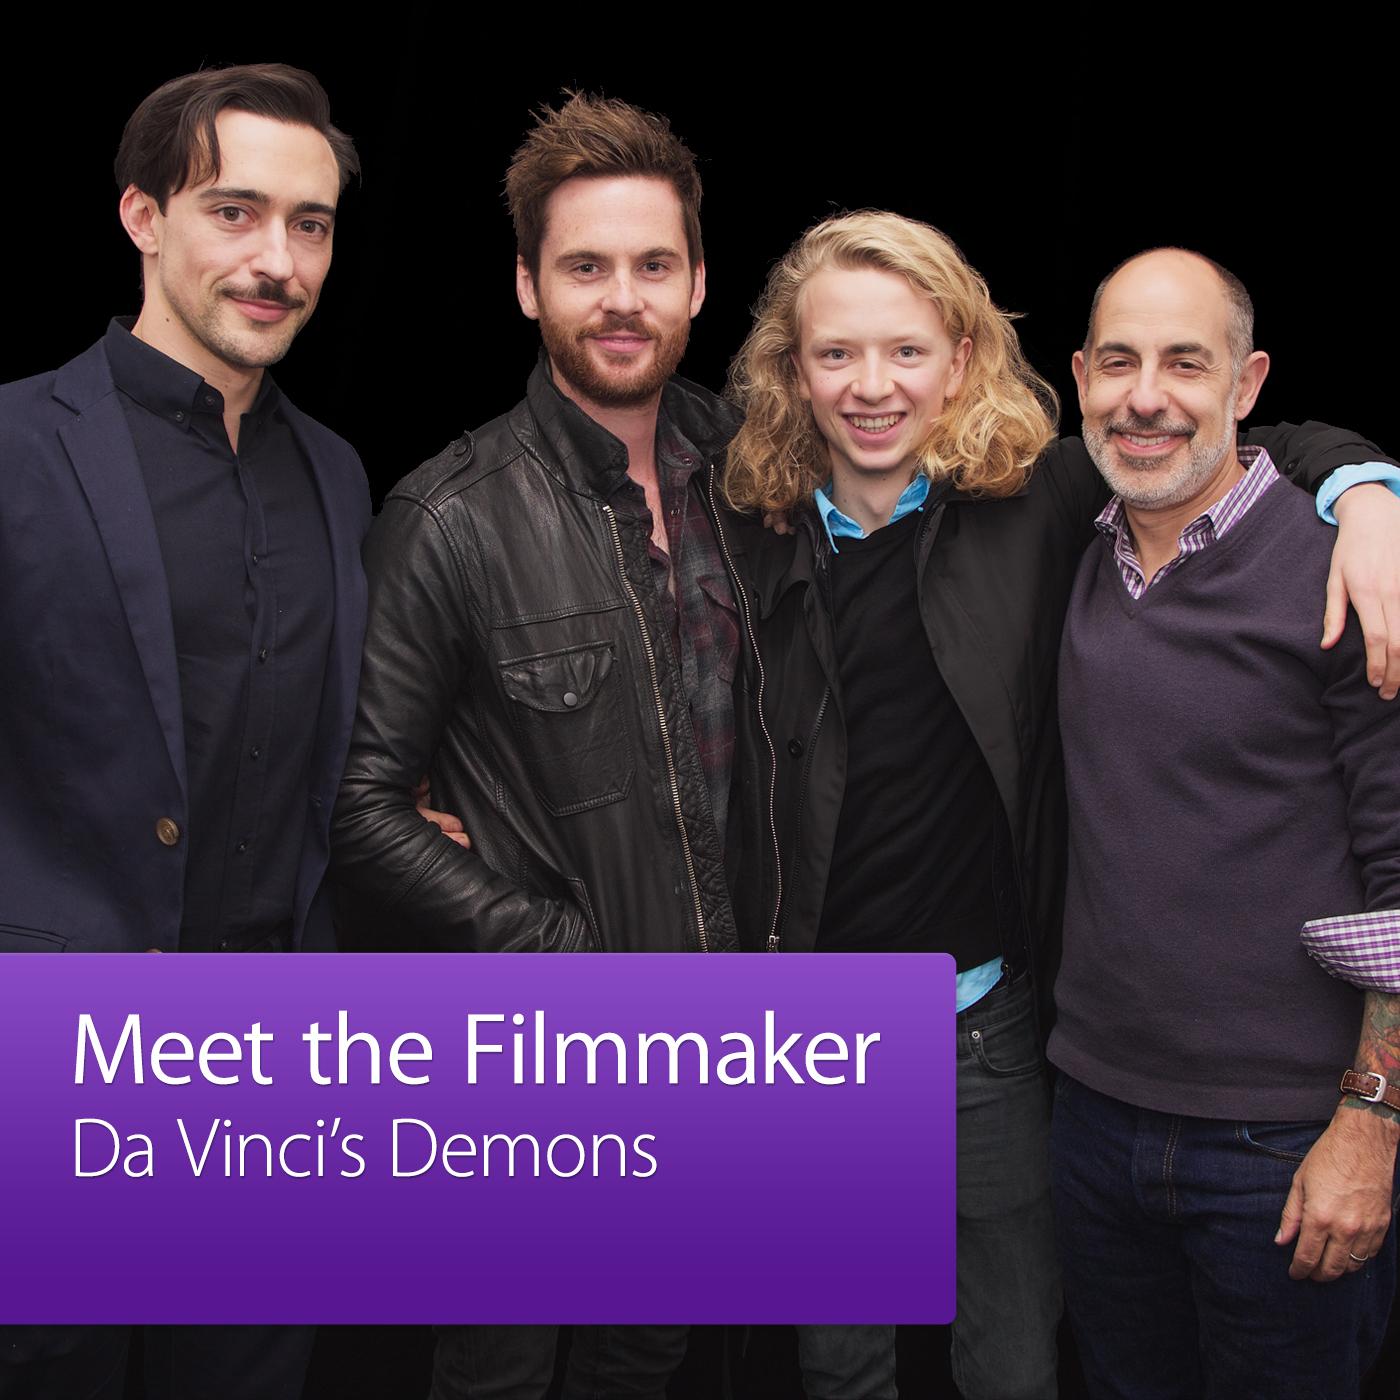 Da Vinci's Demons: Meet the Filmmakers